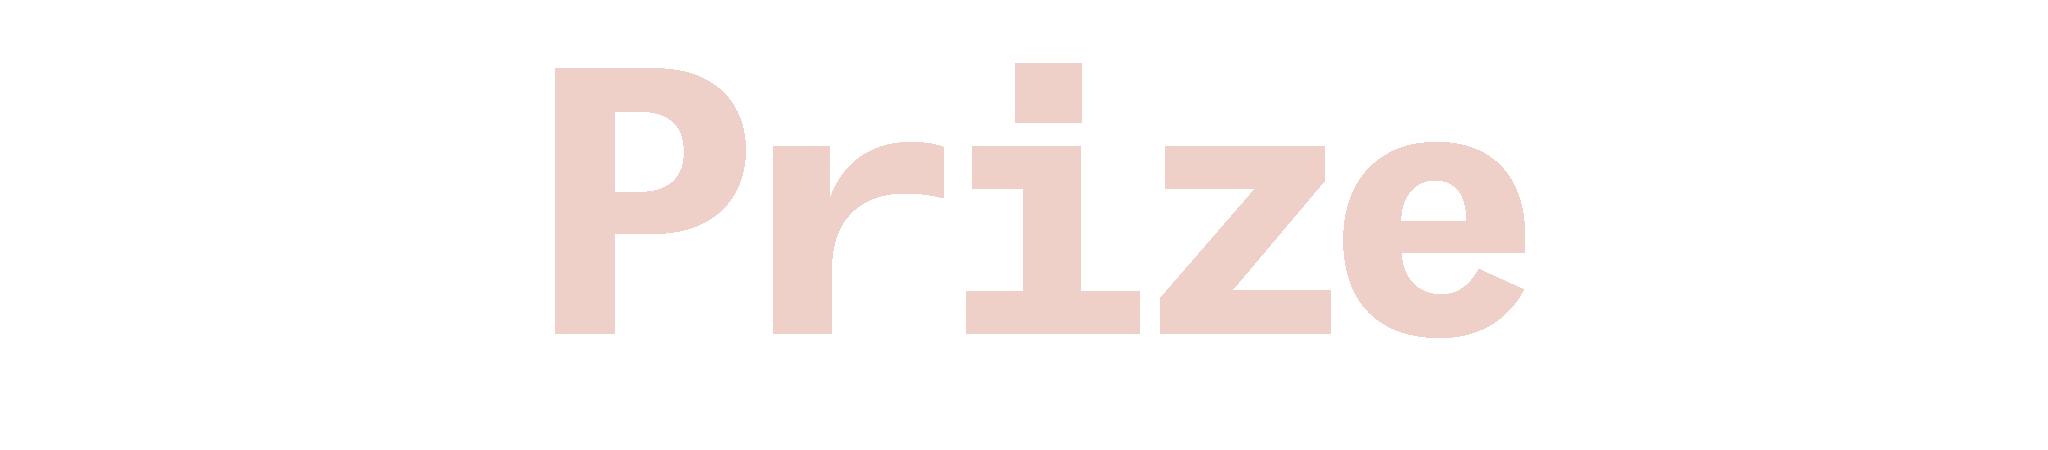 FoT_07A_tekst_Prize